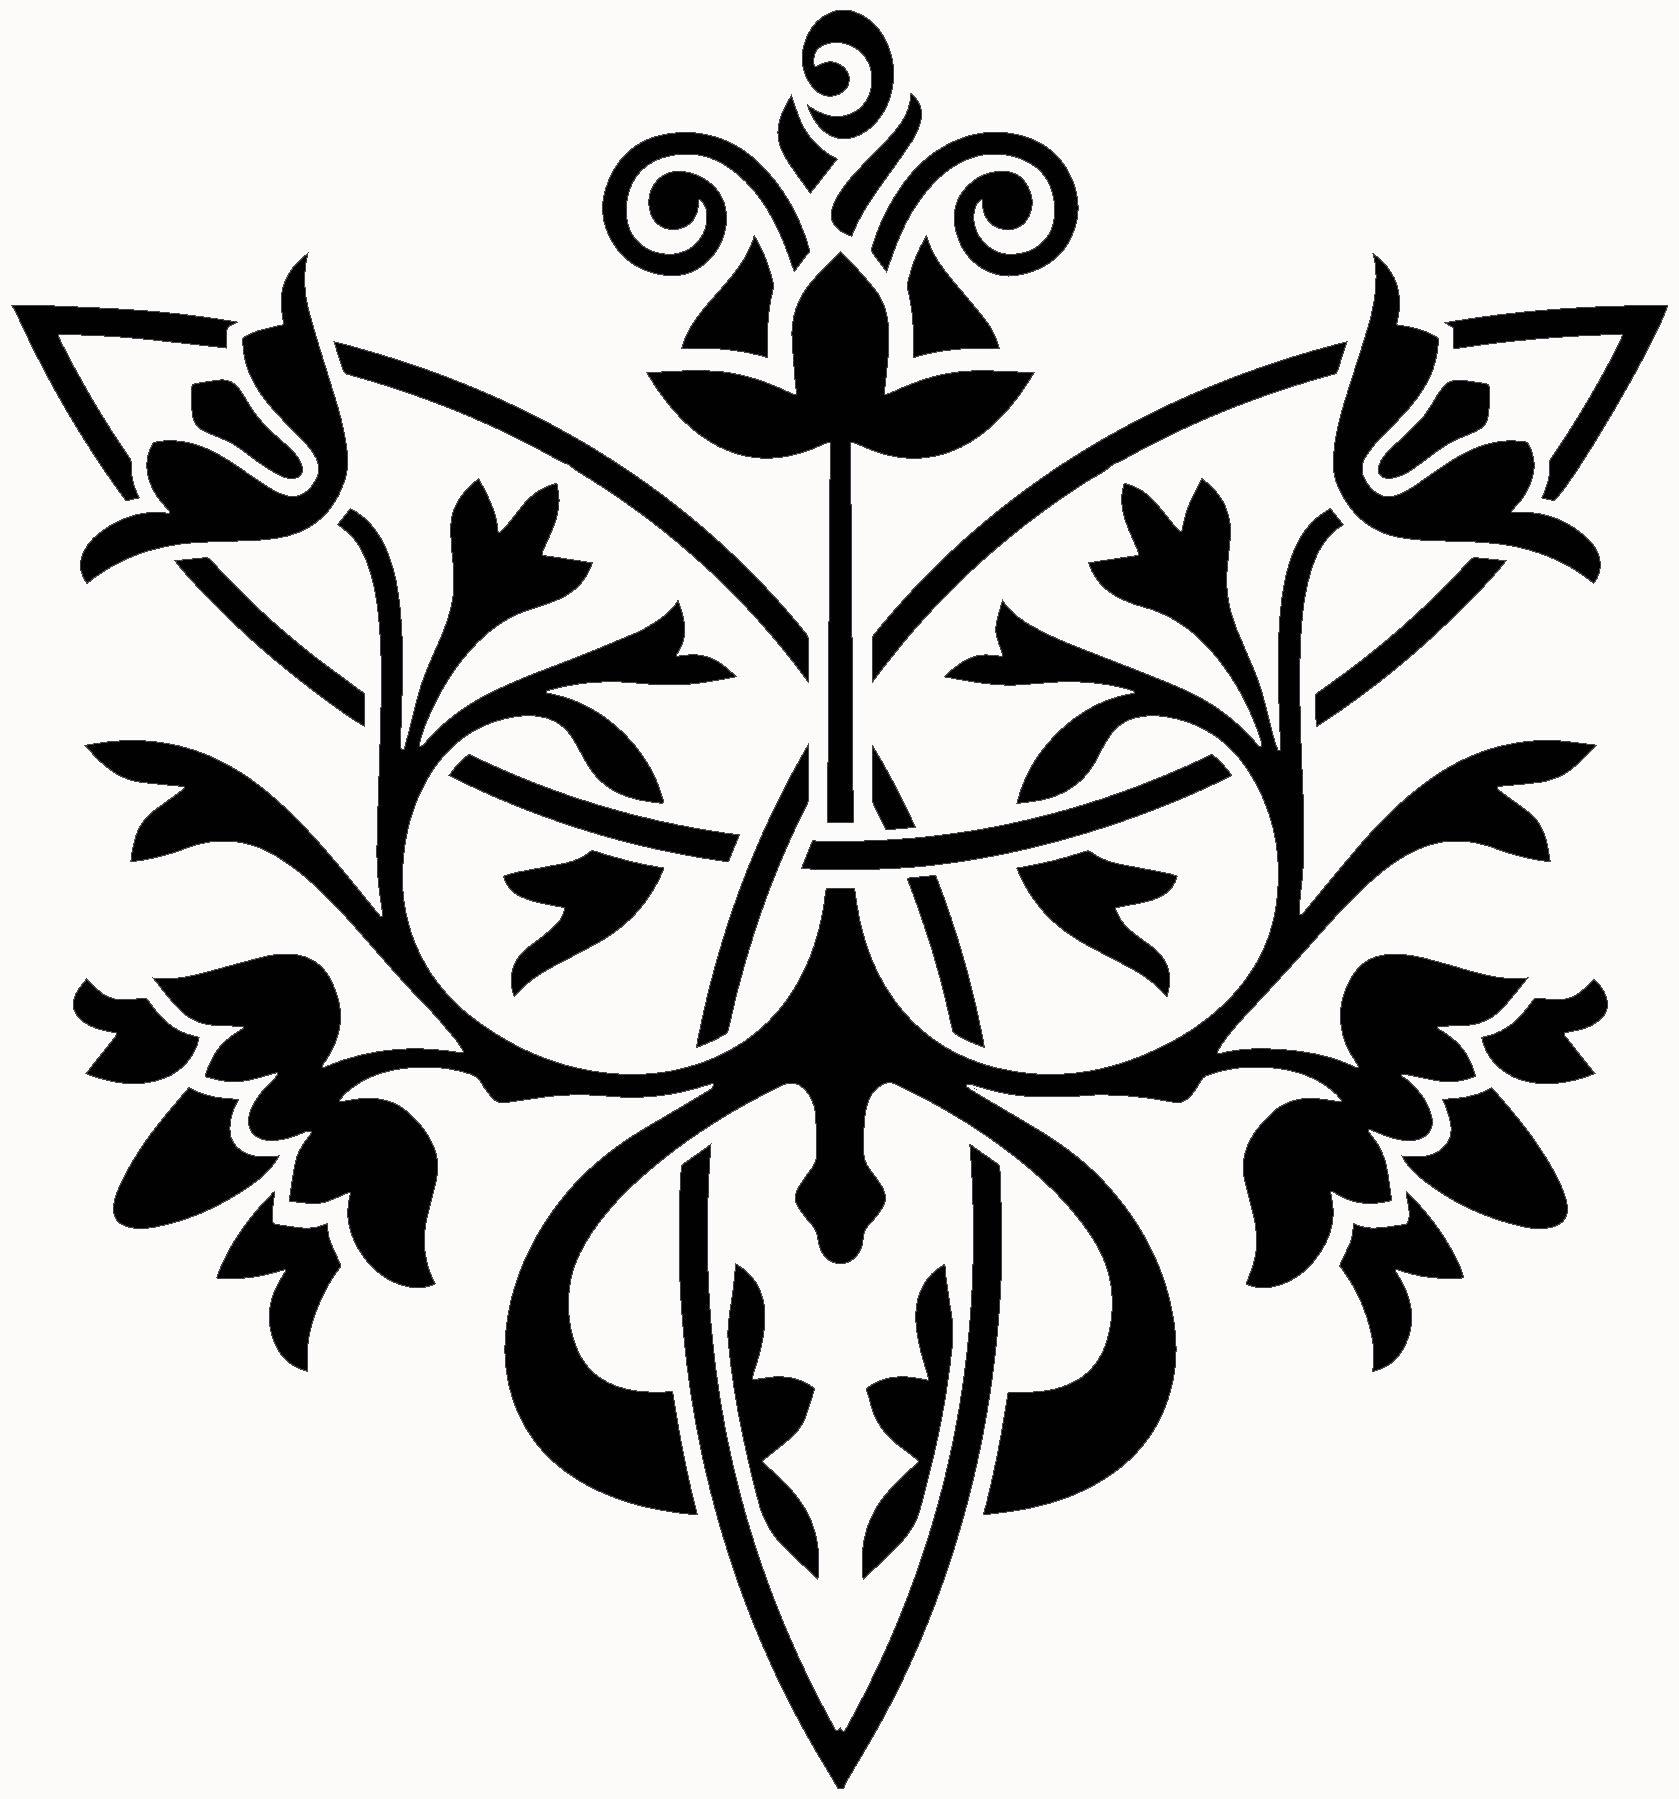 Garden Party - Floral Knot Stencil